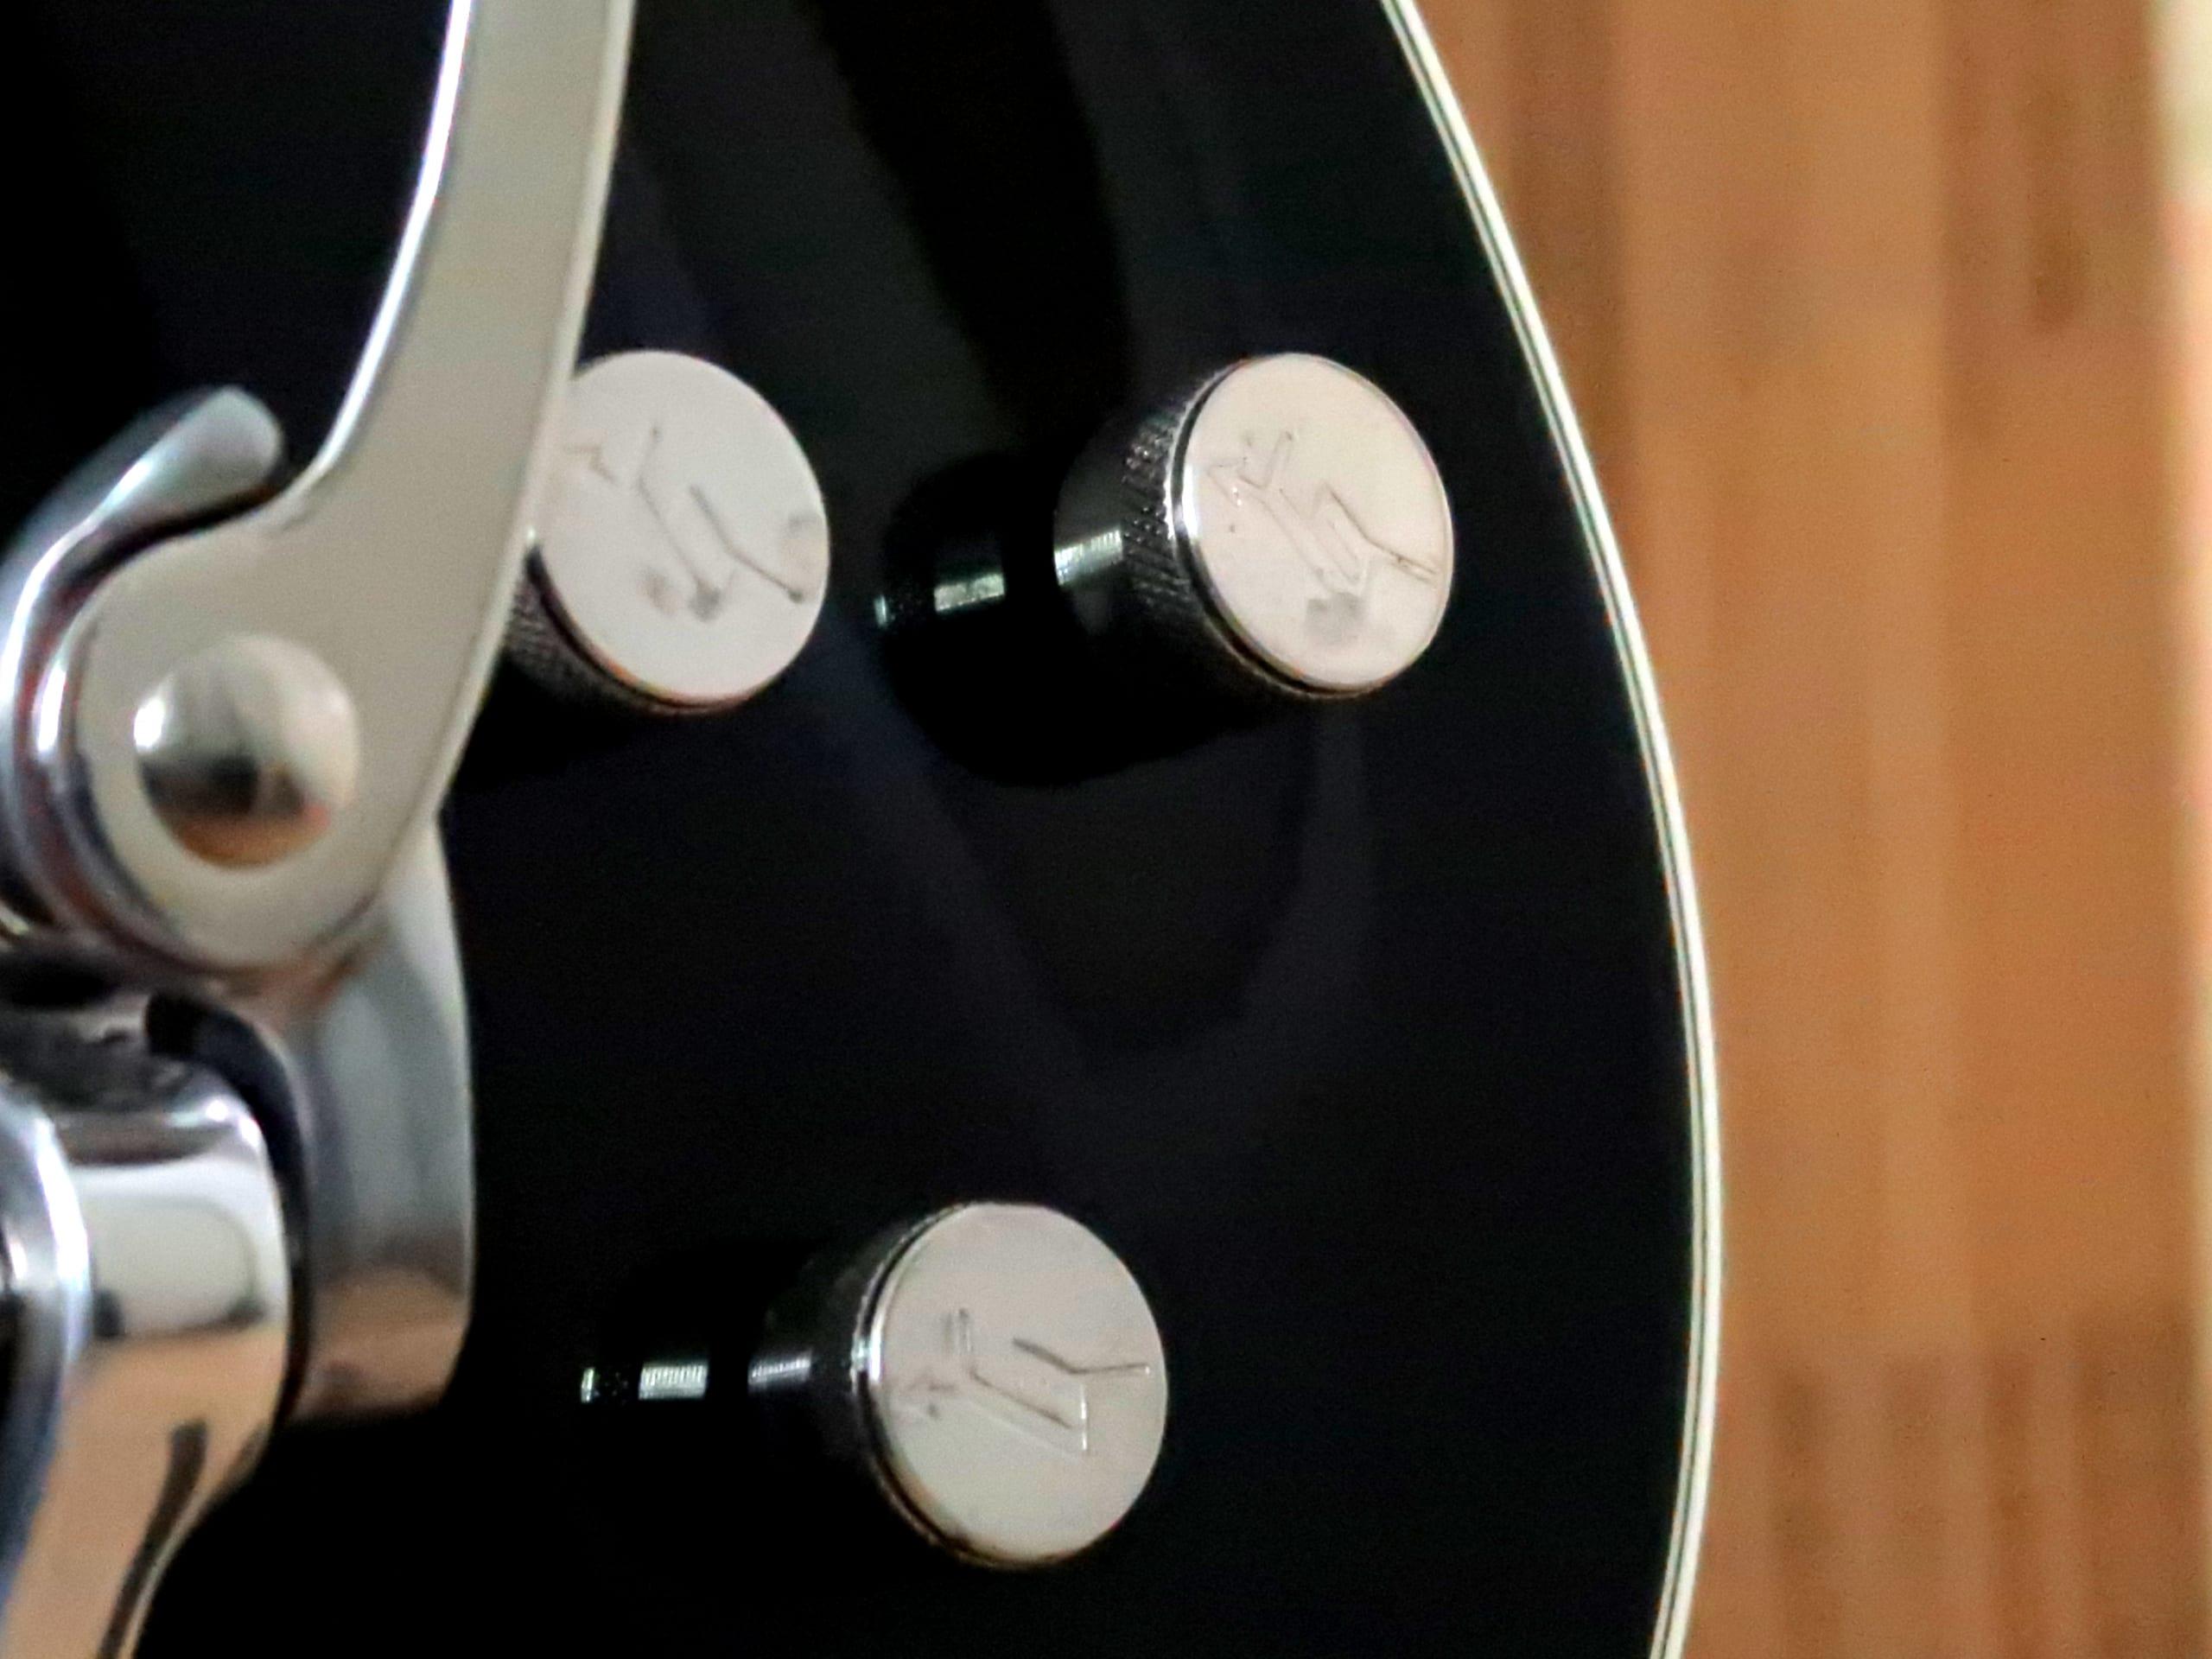 Gretsch 6128T electric guitar closeup control knobs